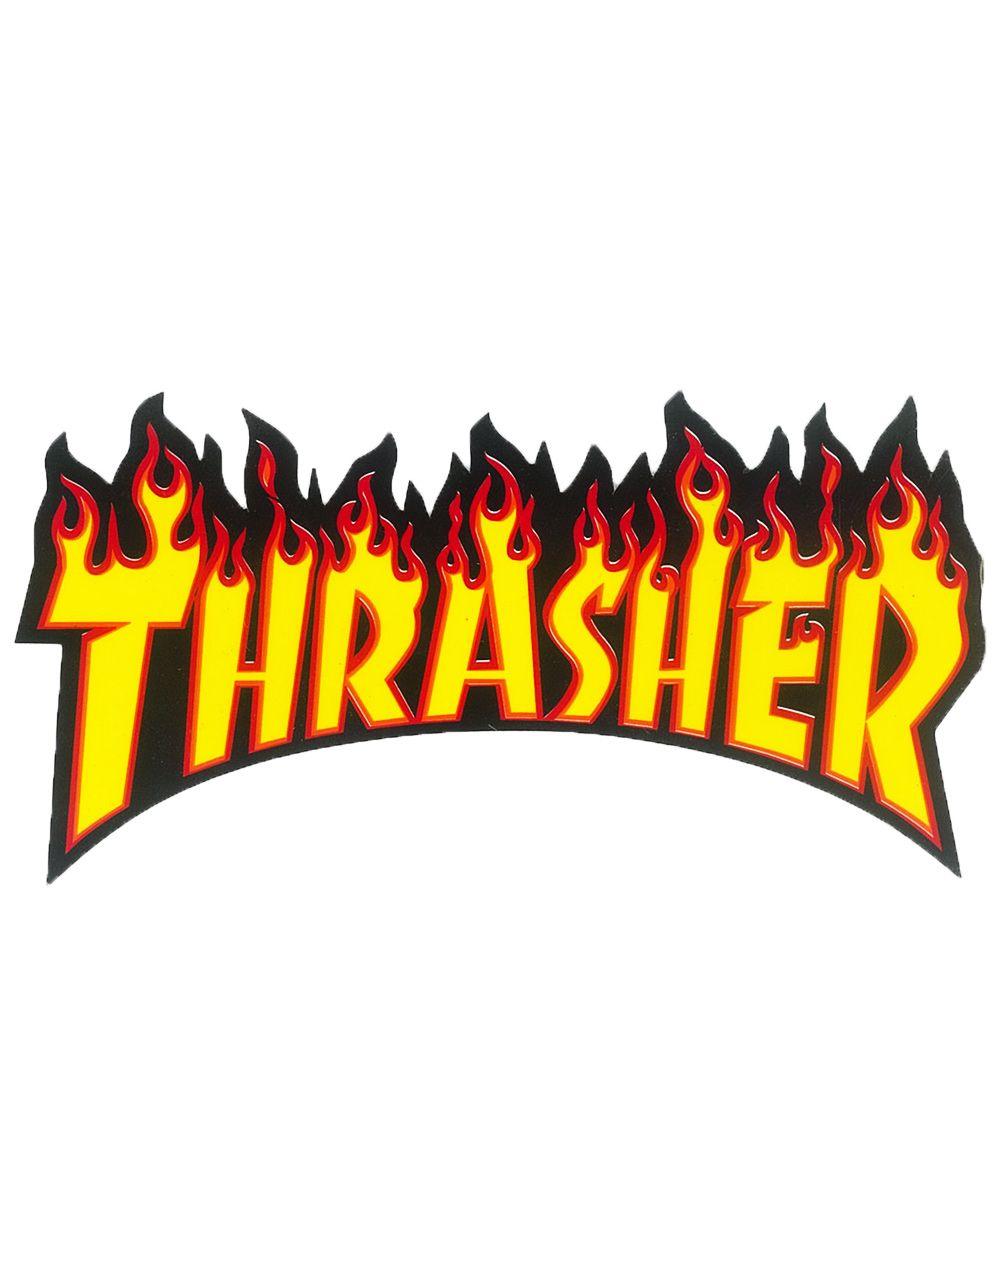 https//www.google.co.uk/search?q=thrasher logo Tumblr